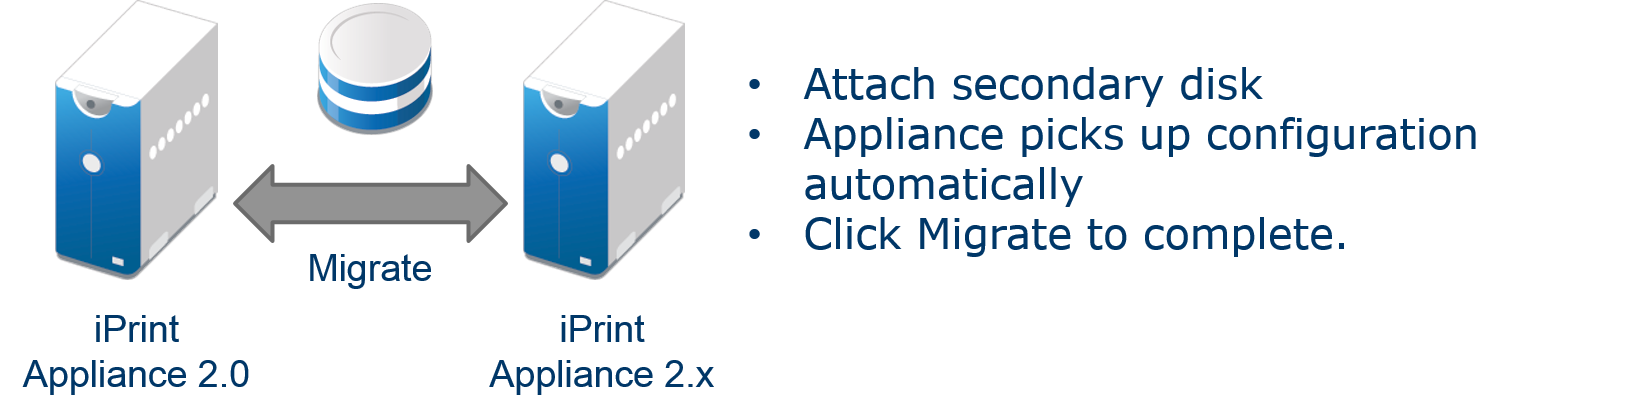 Figure 2:  New migration upgrade path